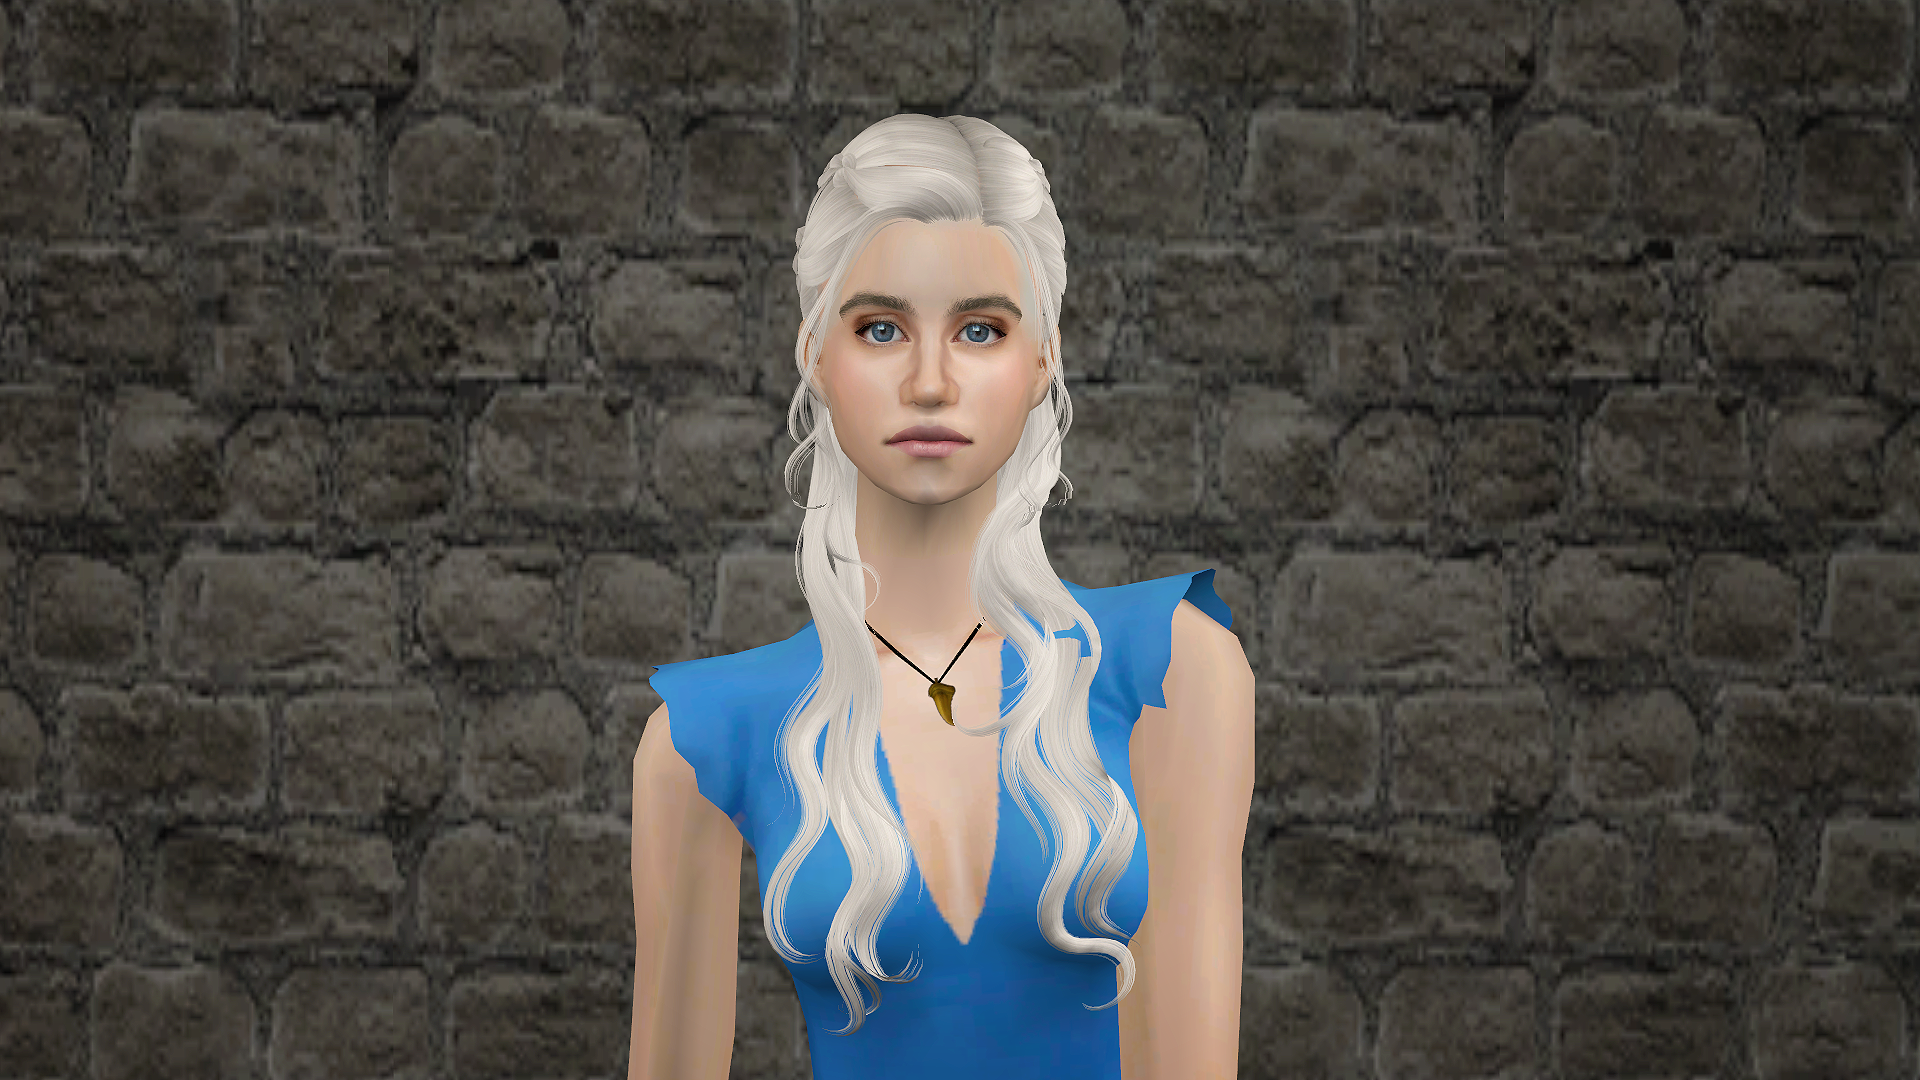 Mod The Sims Game Of Thrones Daenerys Targaryen Emilia